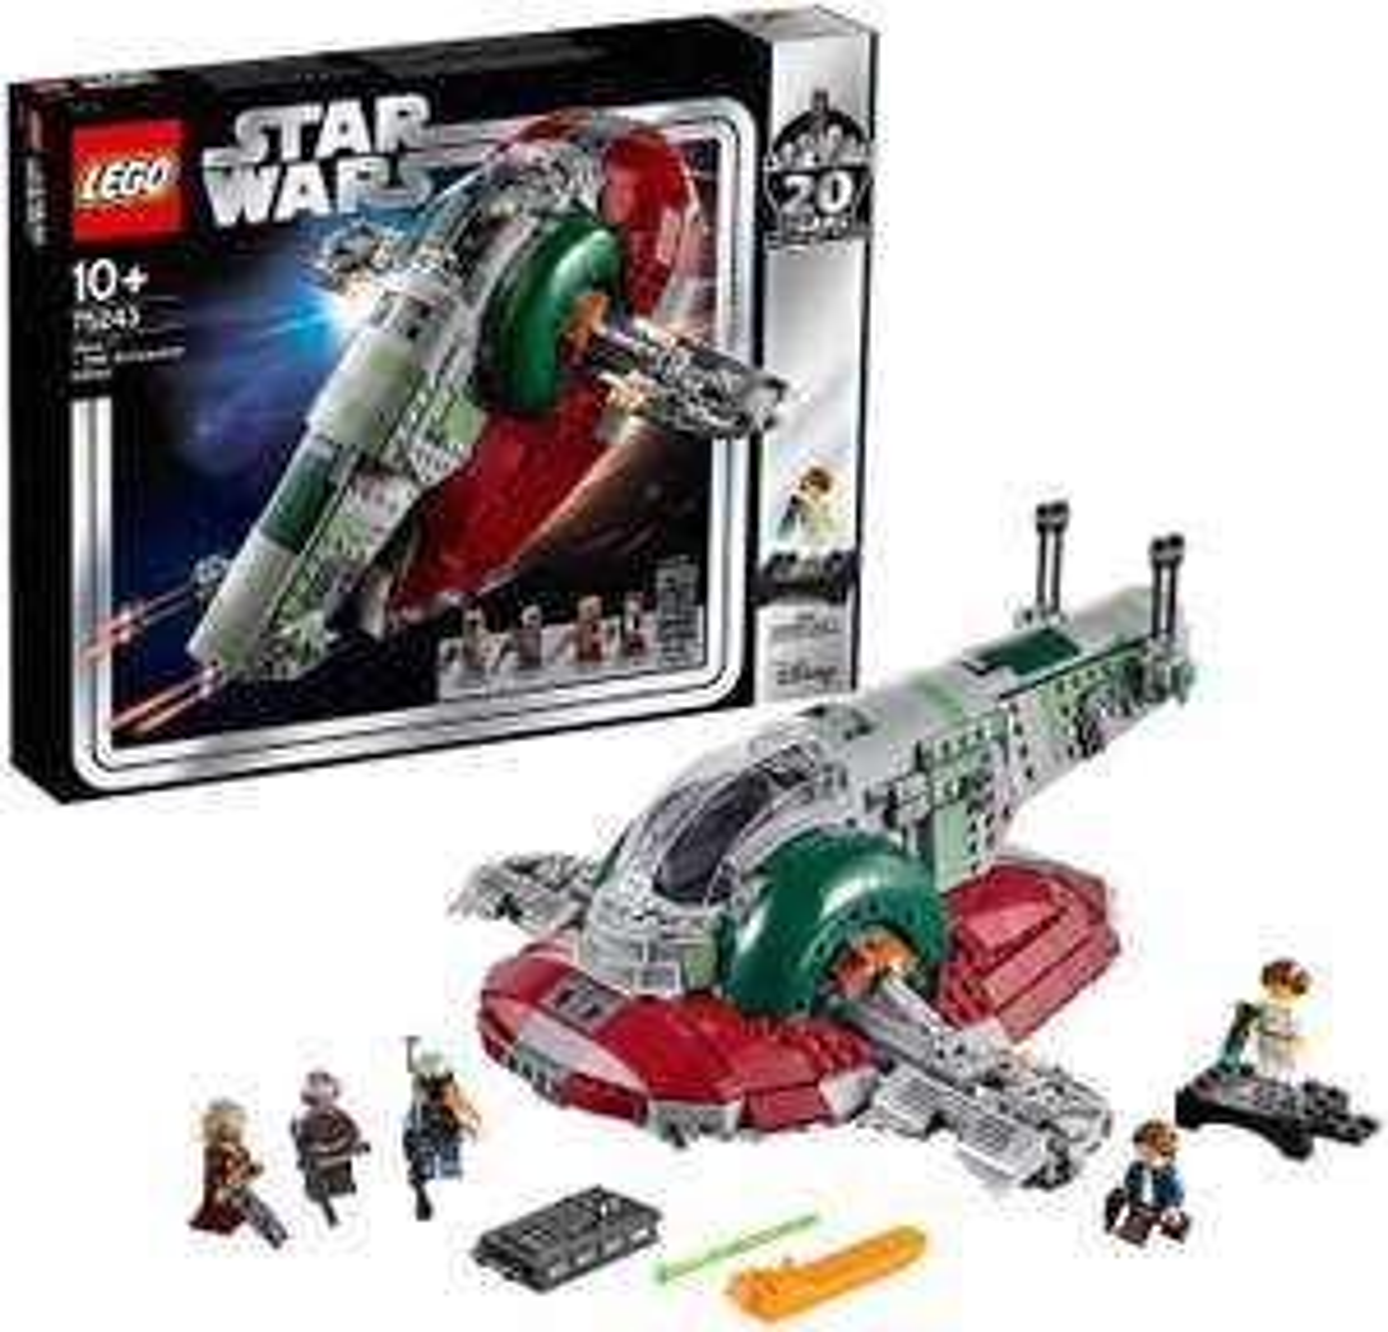 Jeu de construction Lego Star Wars - Slave I - 20 Years (75243)